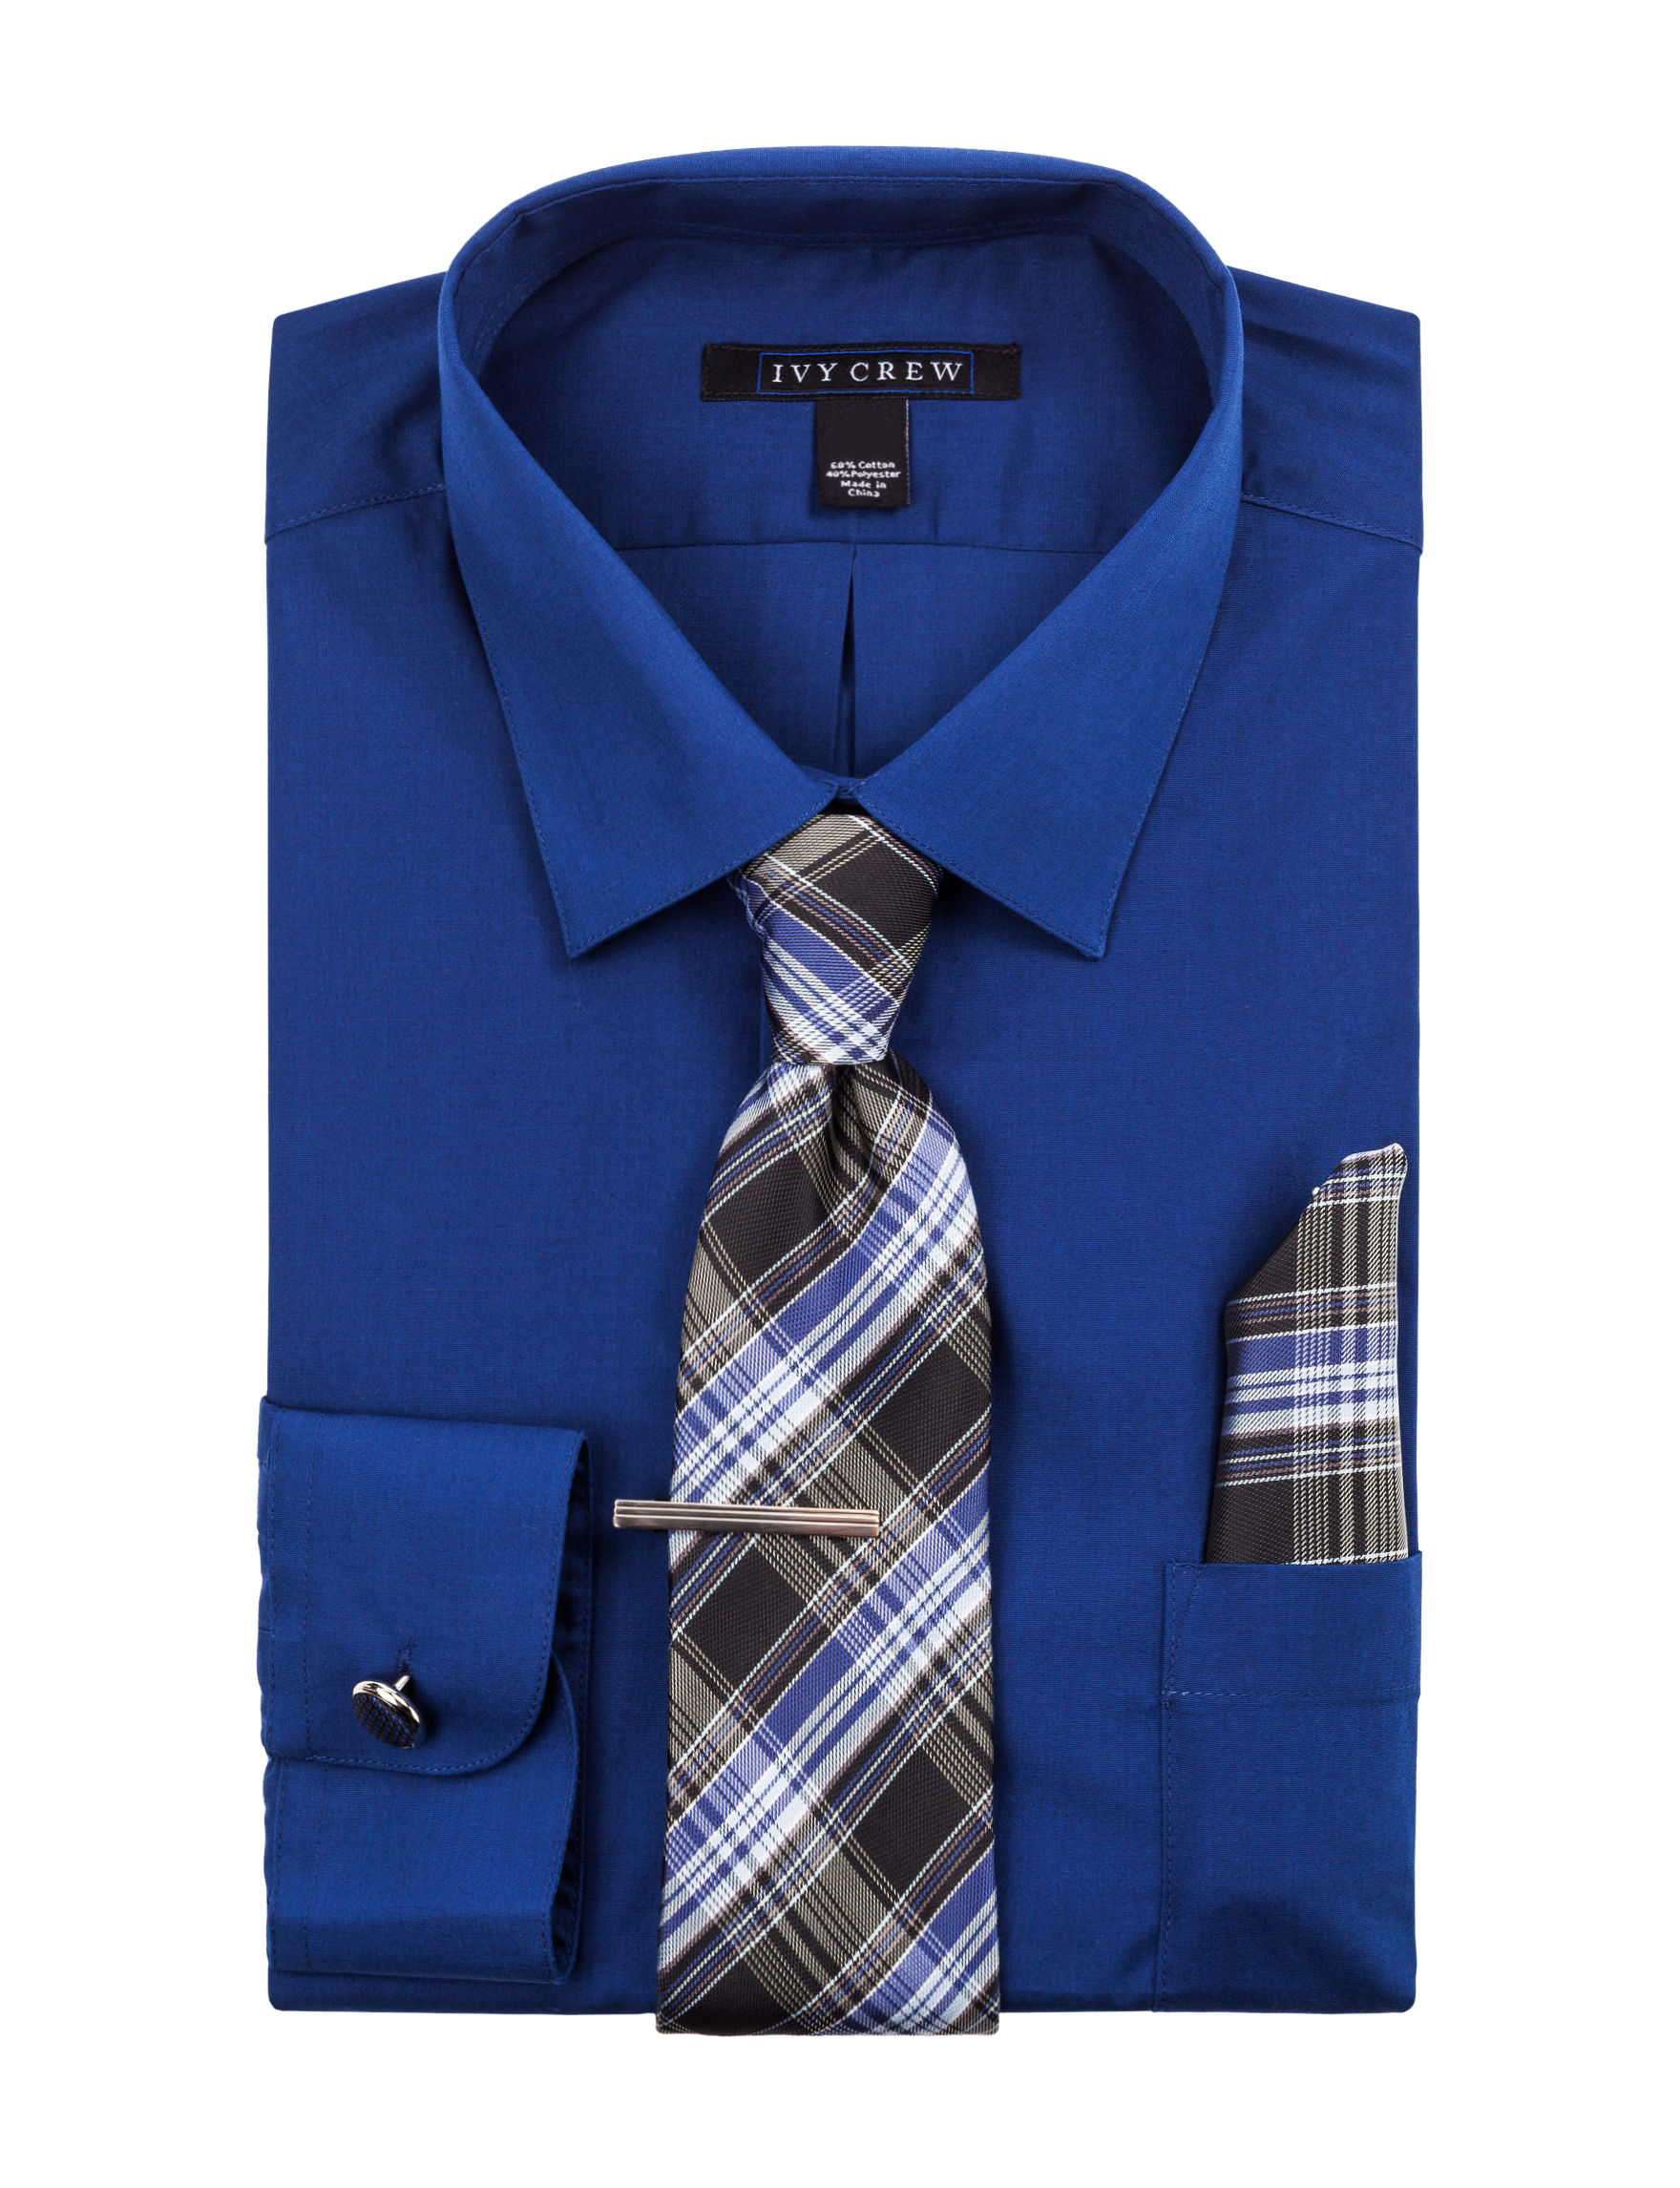 Ivy Crew Estate Blue Dress Shirts